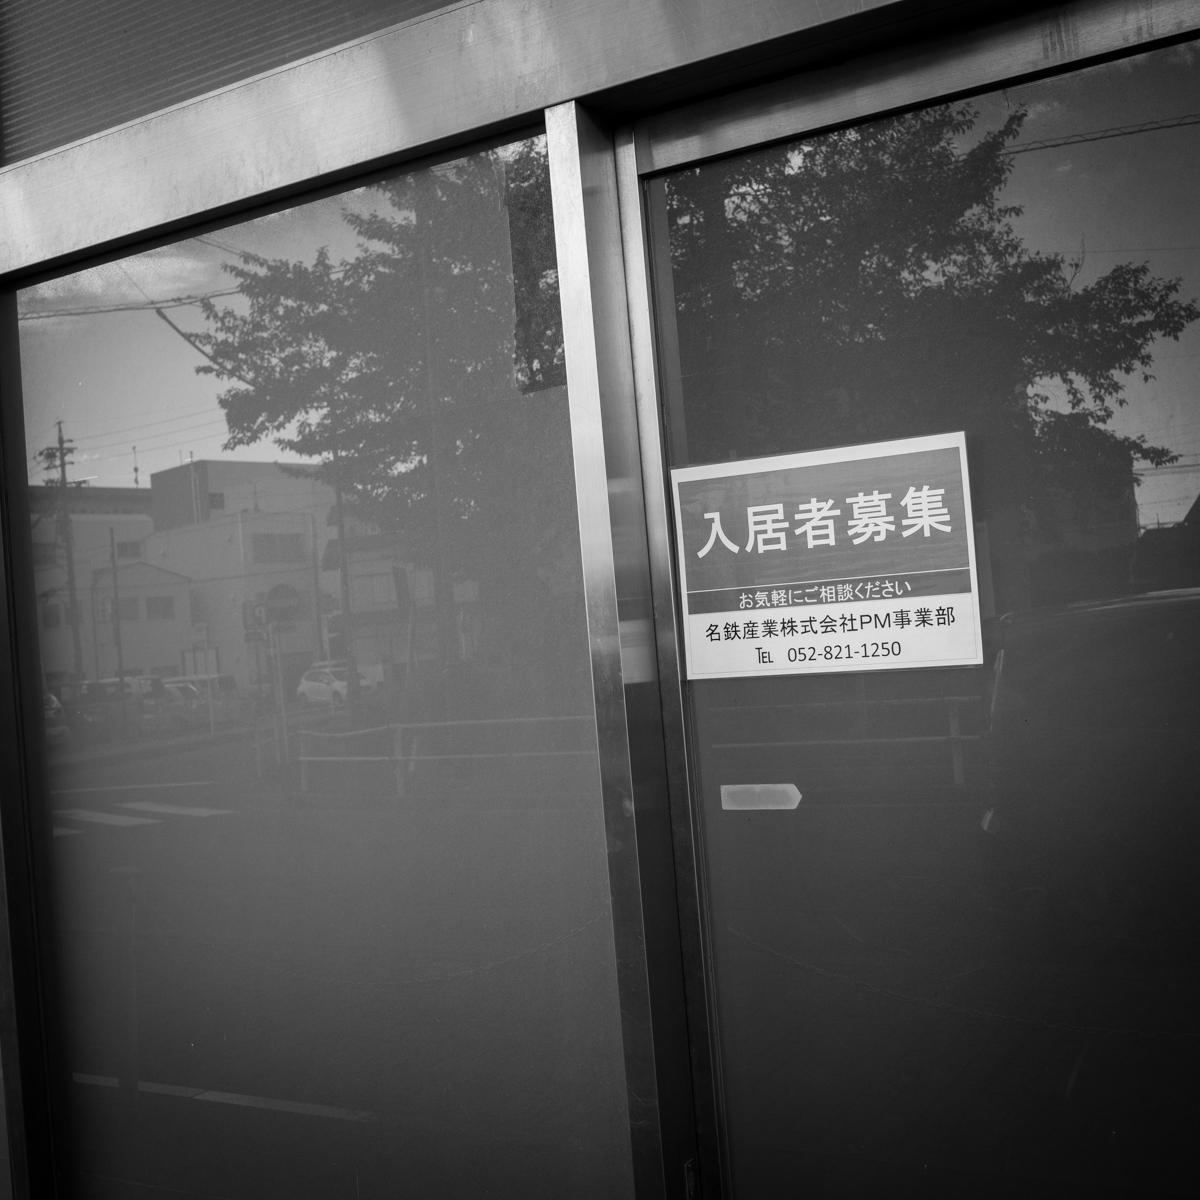 f:id:nagoya-meshi:20190727232145j:plain